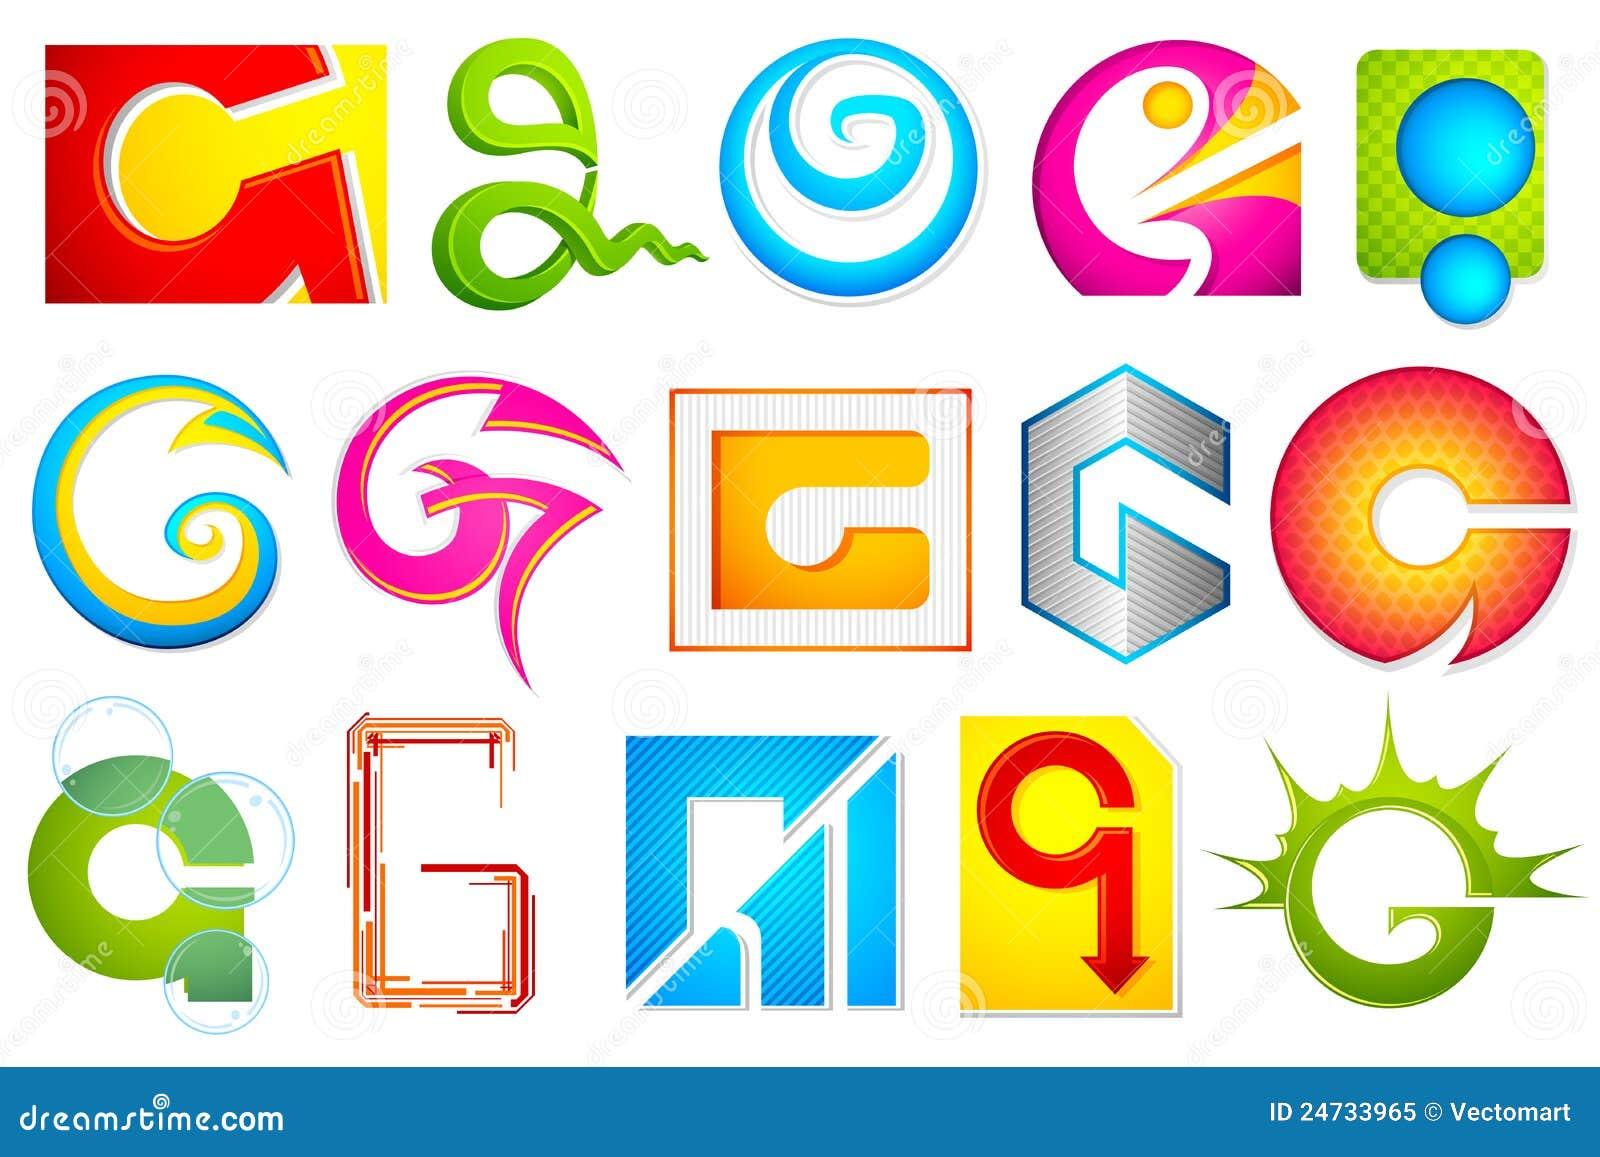 P Alphabet Wallpaper Stylish Font Different Icon with alphabet G